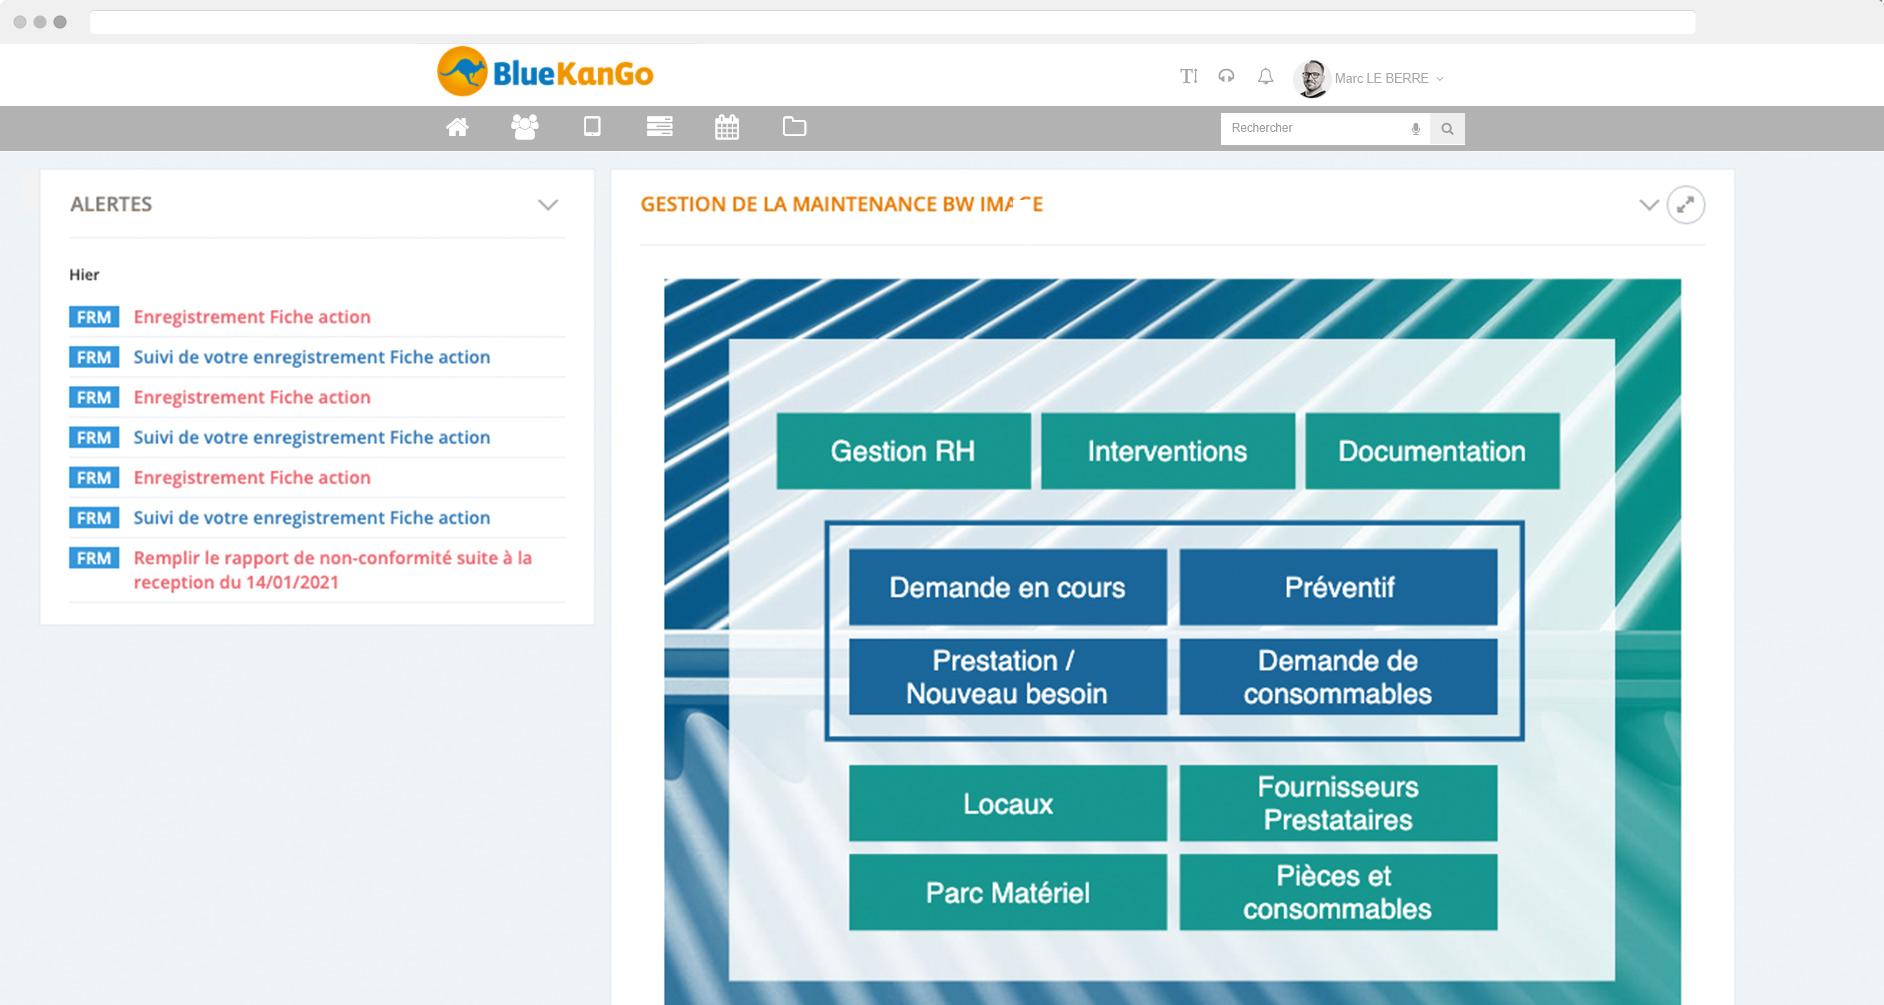 Tableau de bord BlueKanGo Canada sur la gestion de la maintenance